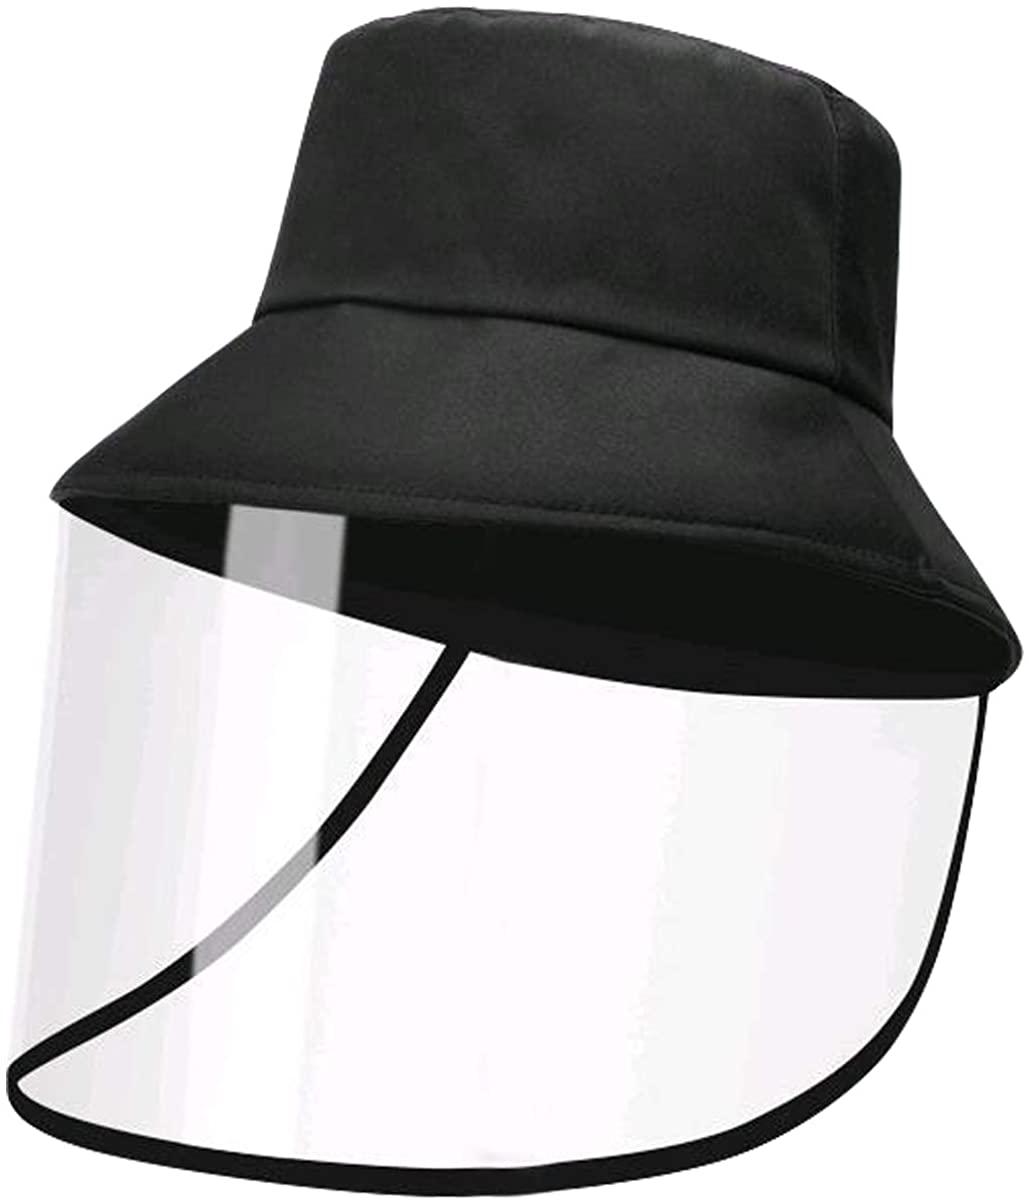 JOYEBUY Unisex Wide Brim Cap Visor Hats UV Protection Summer Visor Sun Hats